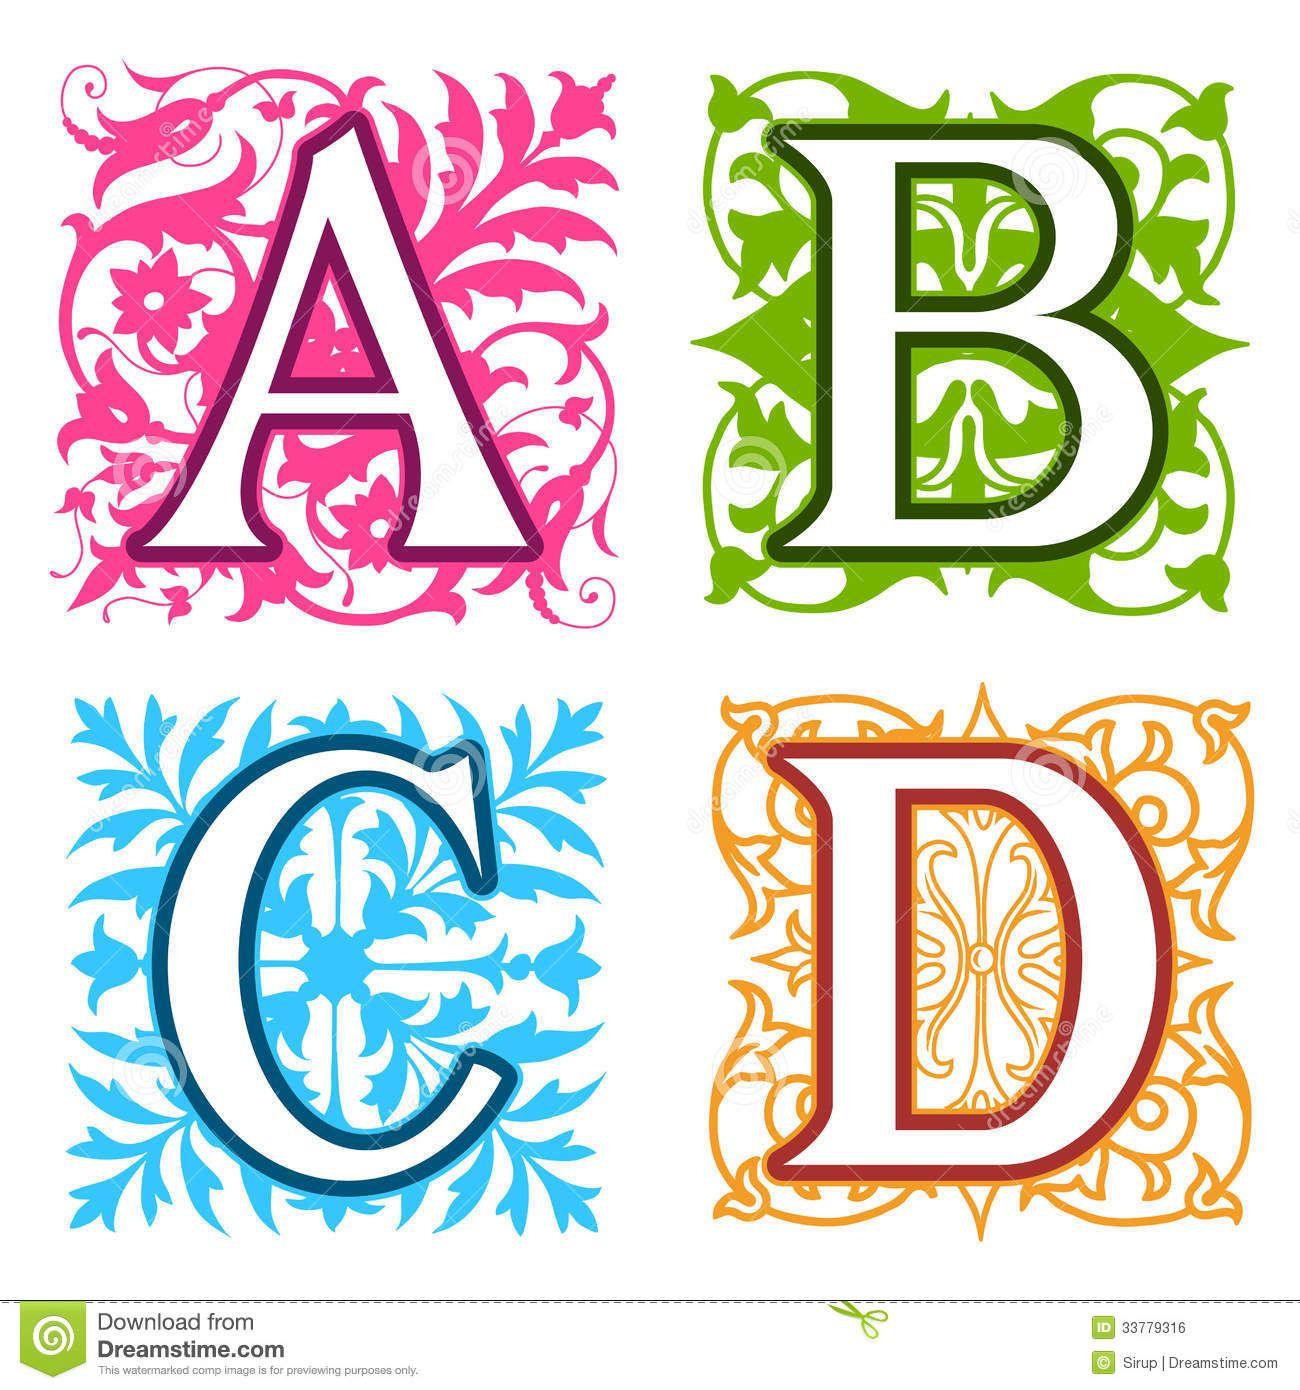 Monogram letter c b together free clipart jpg transparent download A, B, C, D, Alphabet Letters Floral Elements Royalty Free Stock ... jpg transparent download